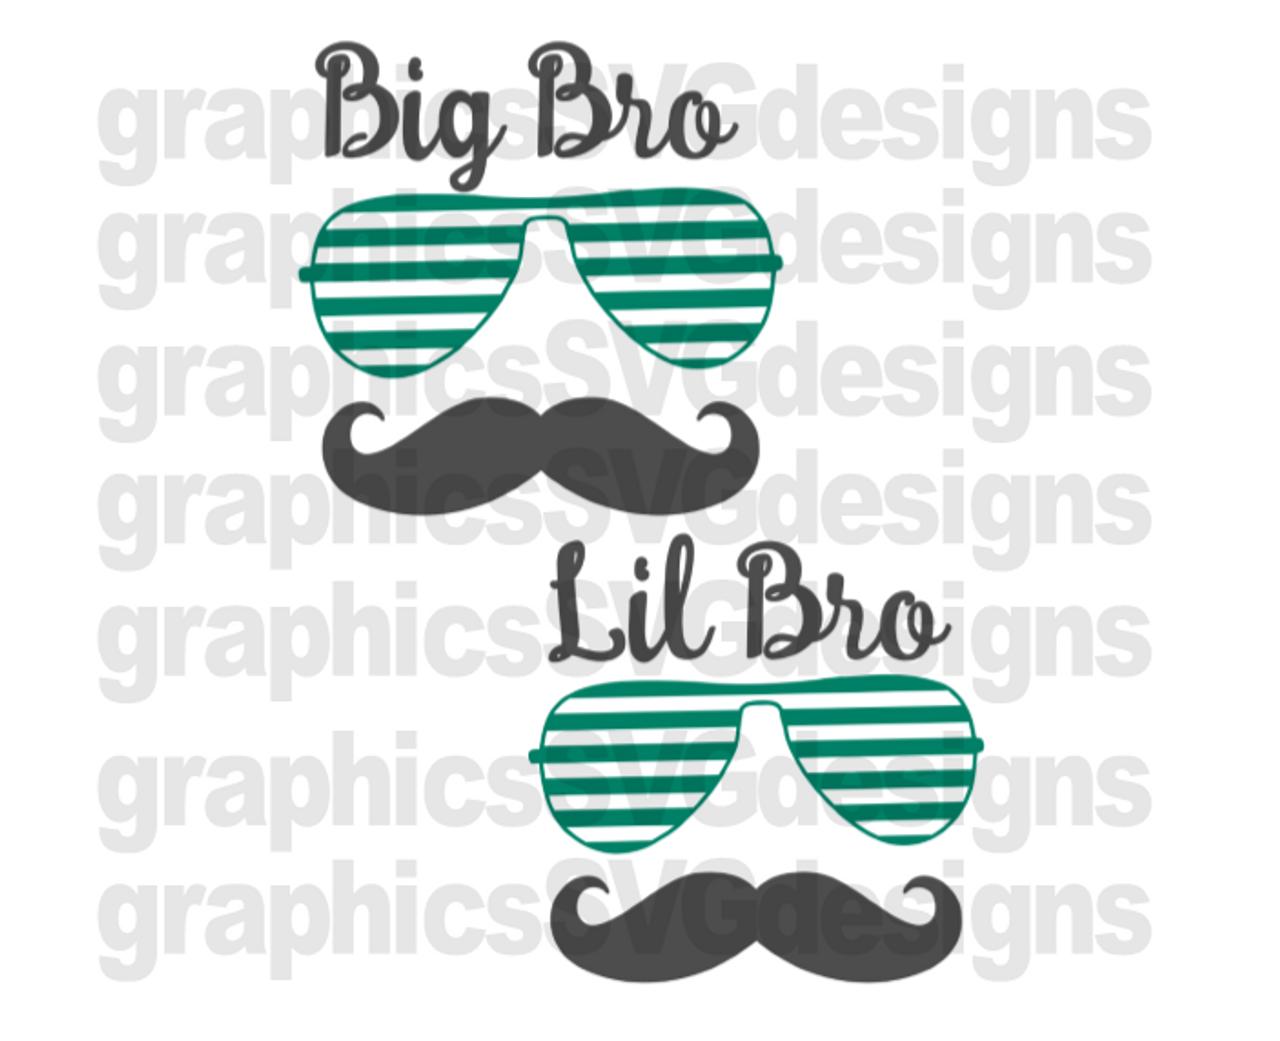 Big Bro Little Bro Digital Download Svg Dxf Png Cutting File